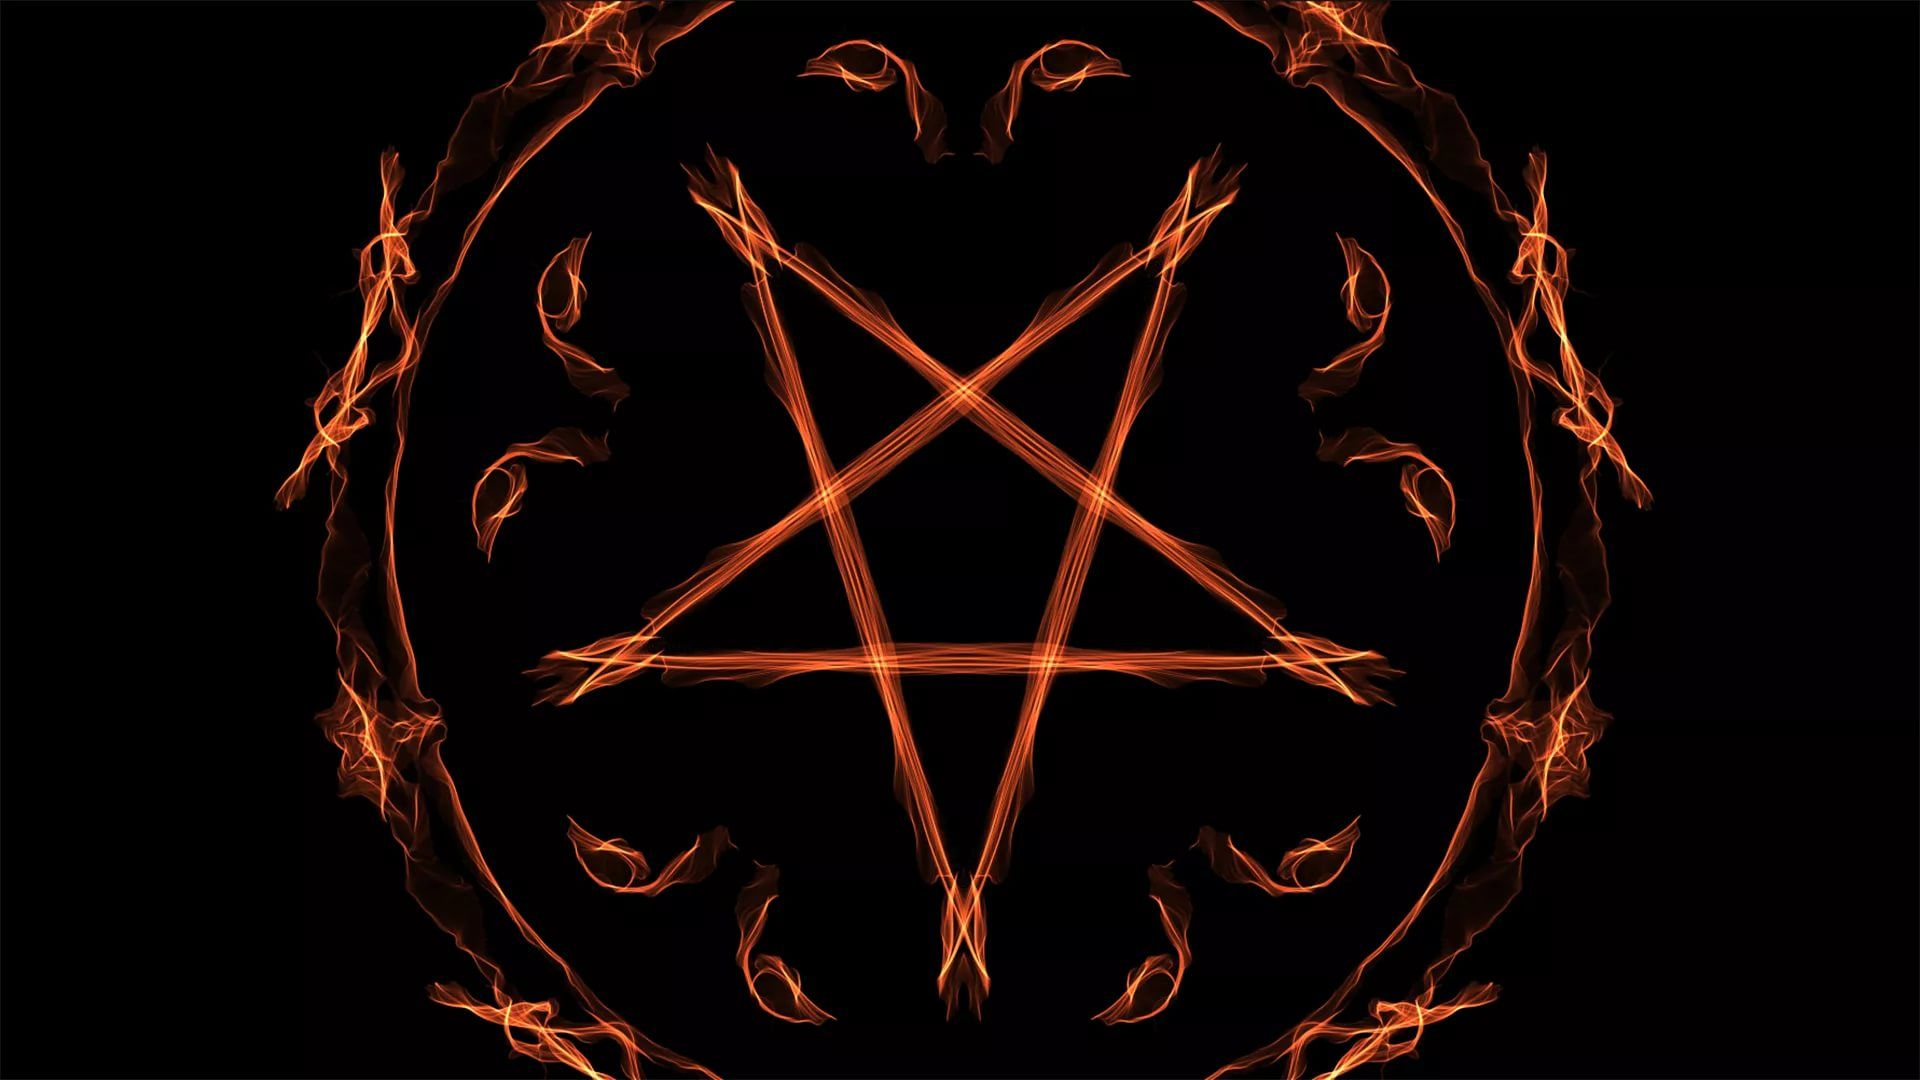 Pentagram background wallpaper